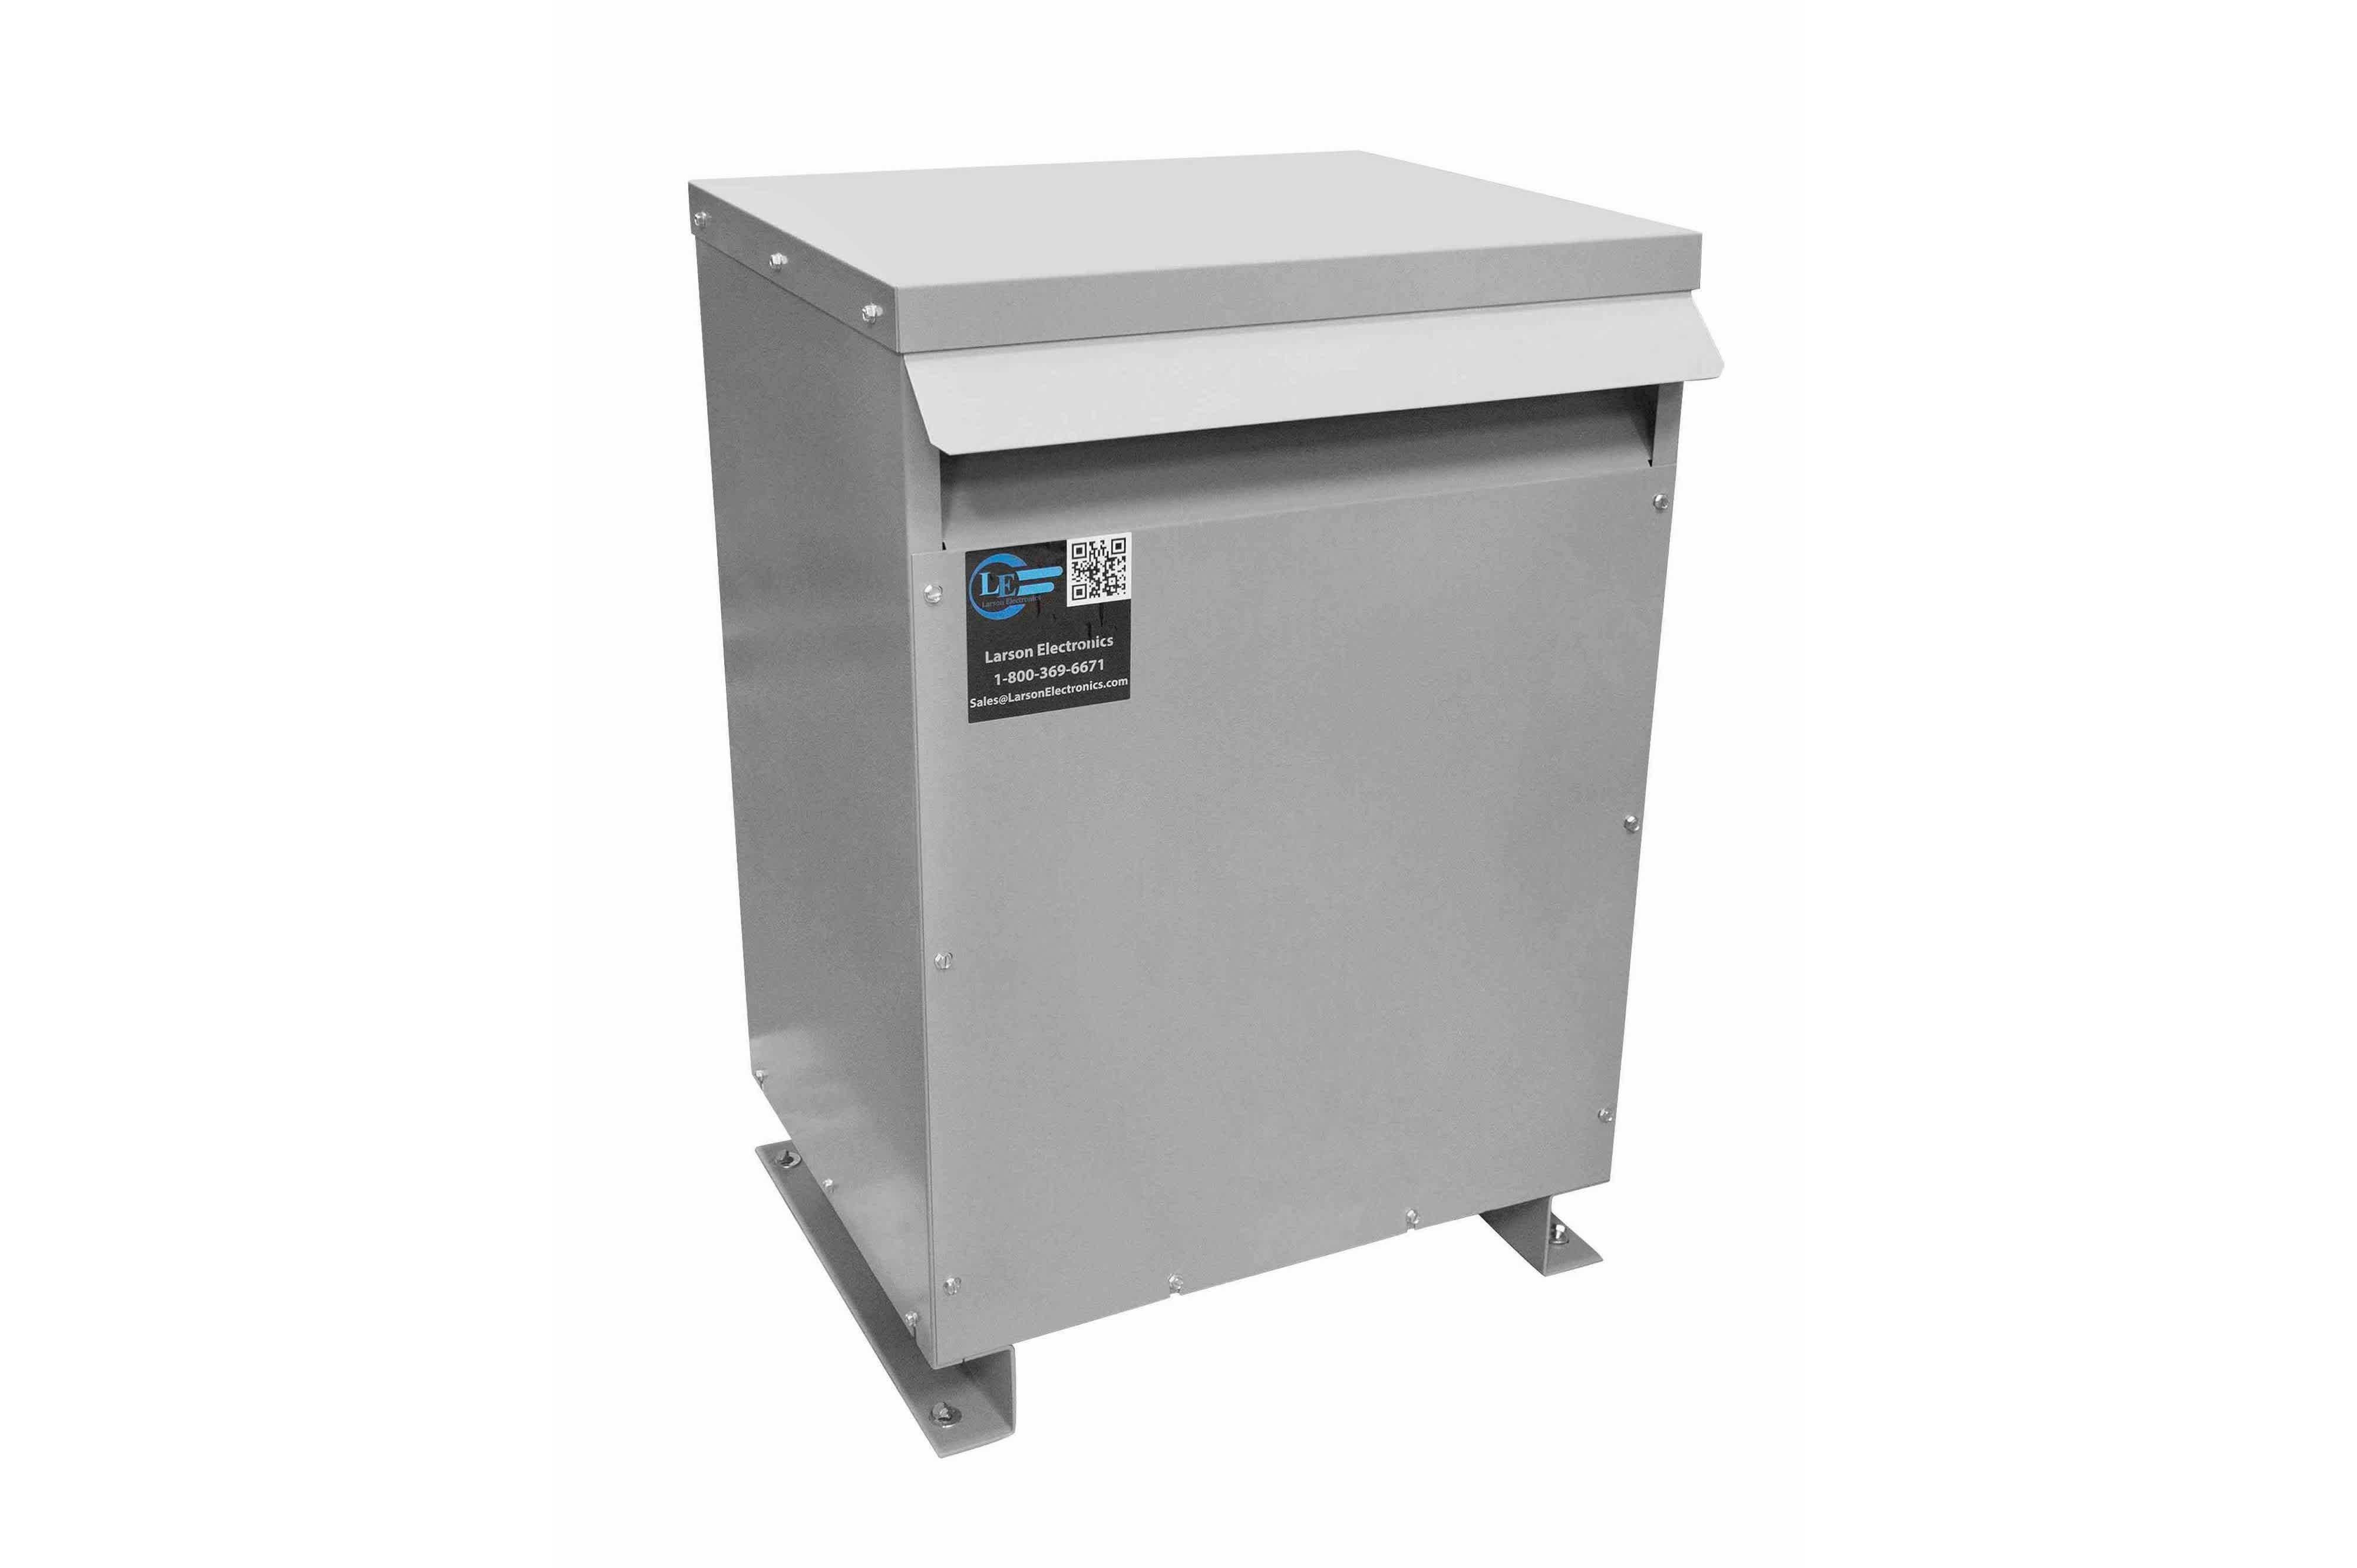 65 kVA 3PH Isolation Transformer, 460V Wye Primary, 208Y/120 Wye-N Secondary, N3R, Ventilated, 60 Hz